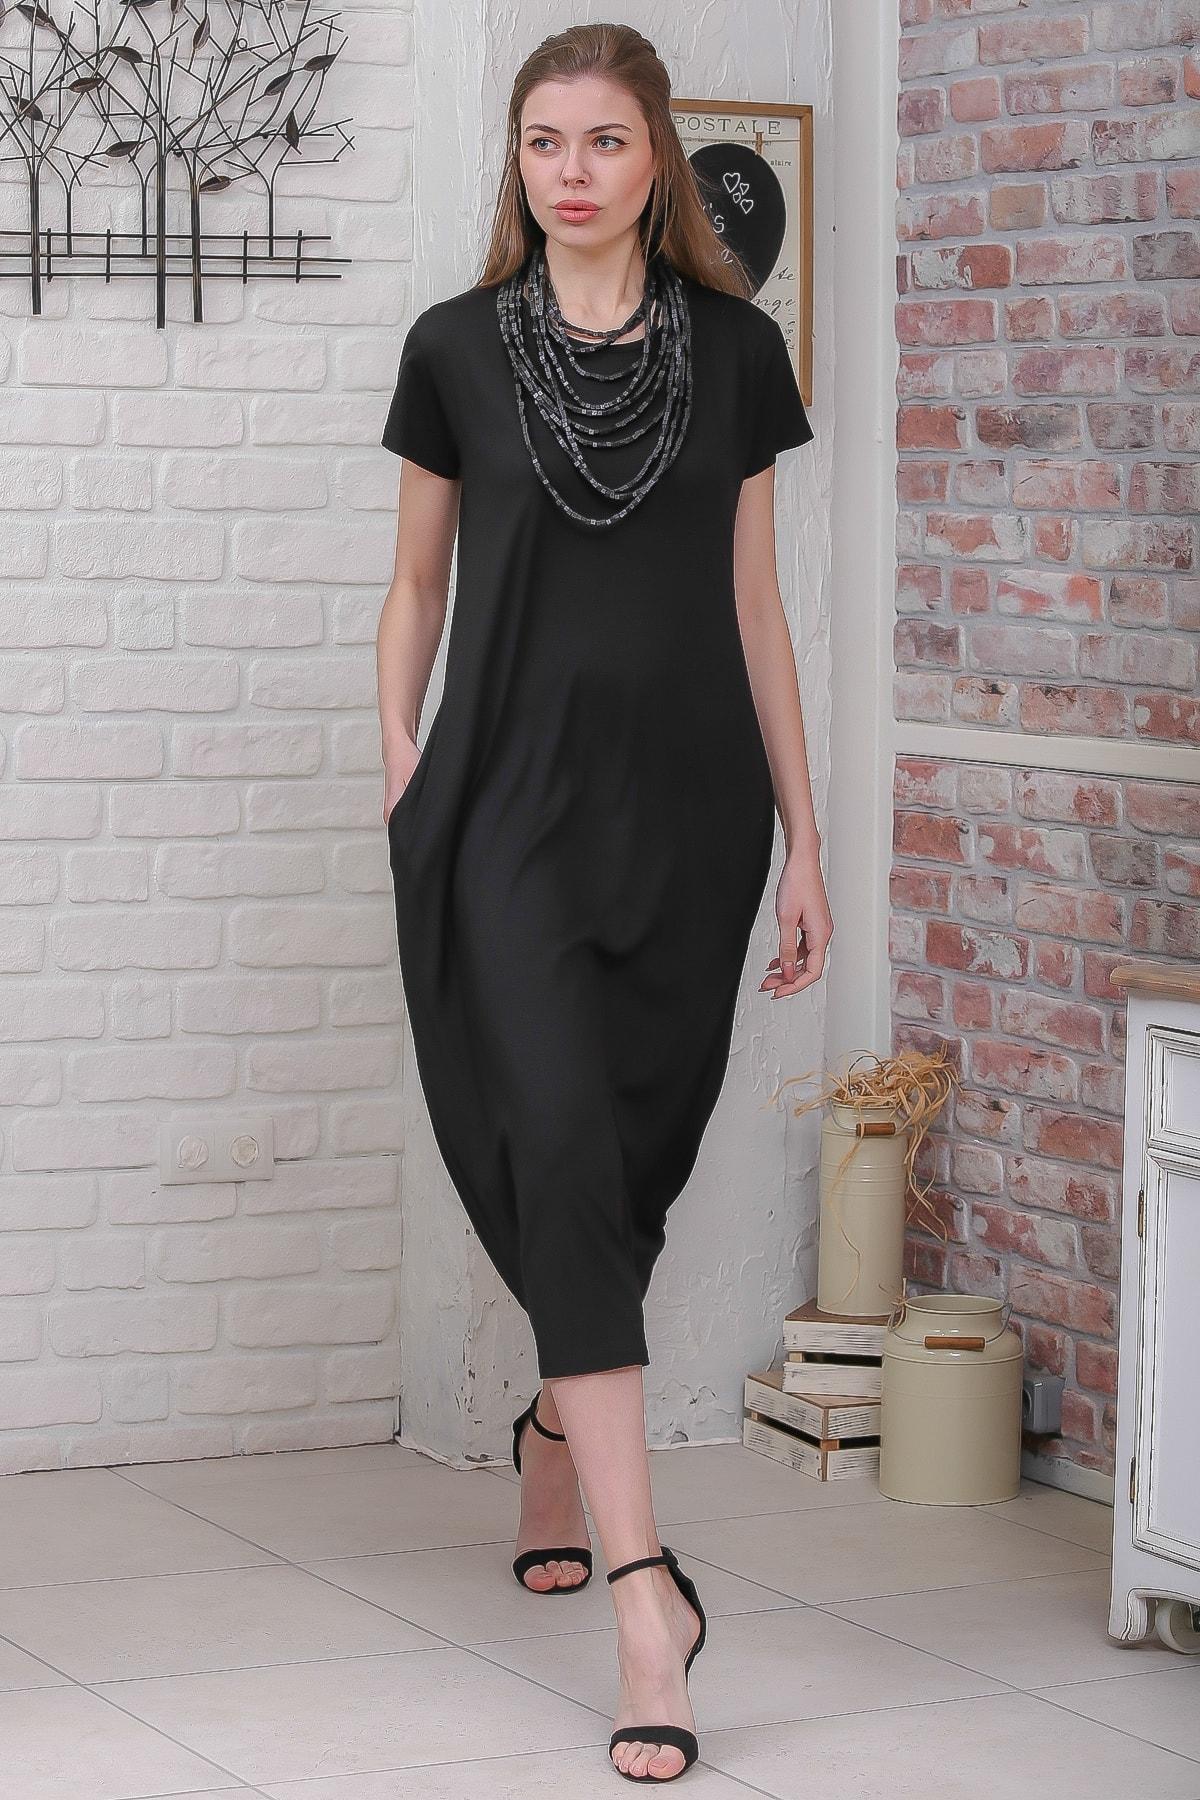 Chiccy Kadın Siyah Sıfır Yaka Kısa Kollu Gizli Cepli Salaş Elbise M10160000EL95531